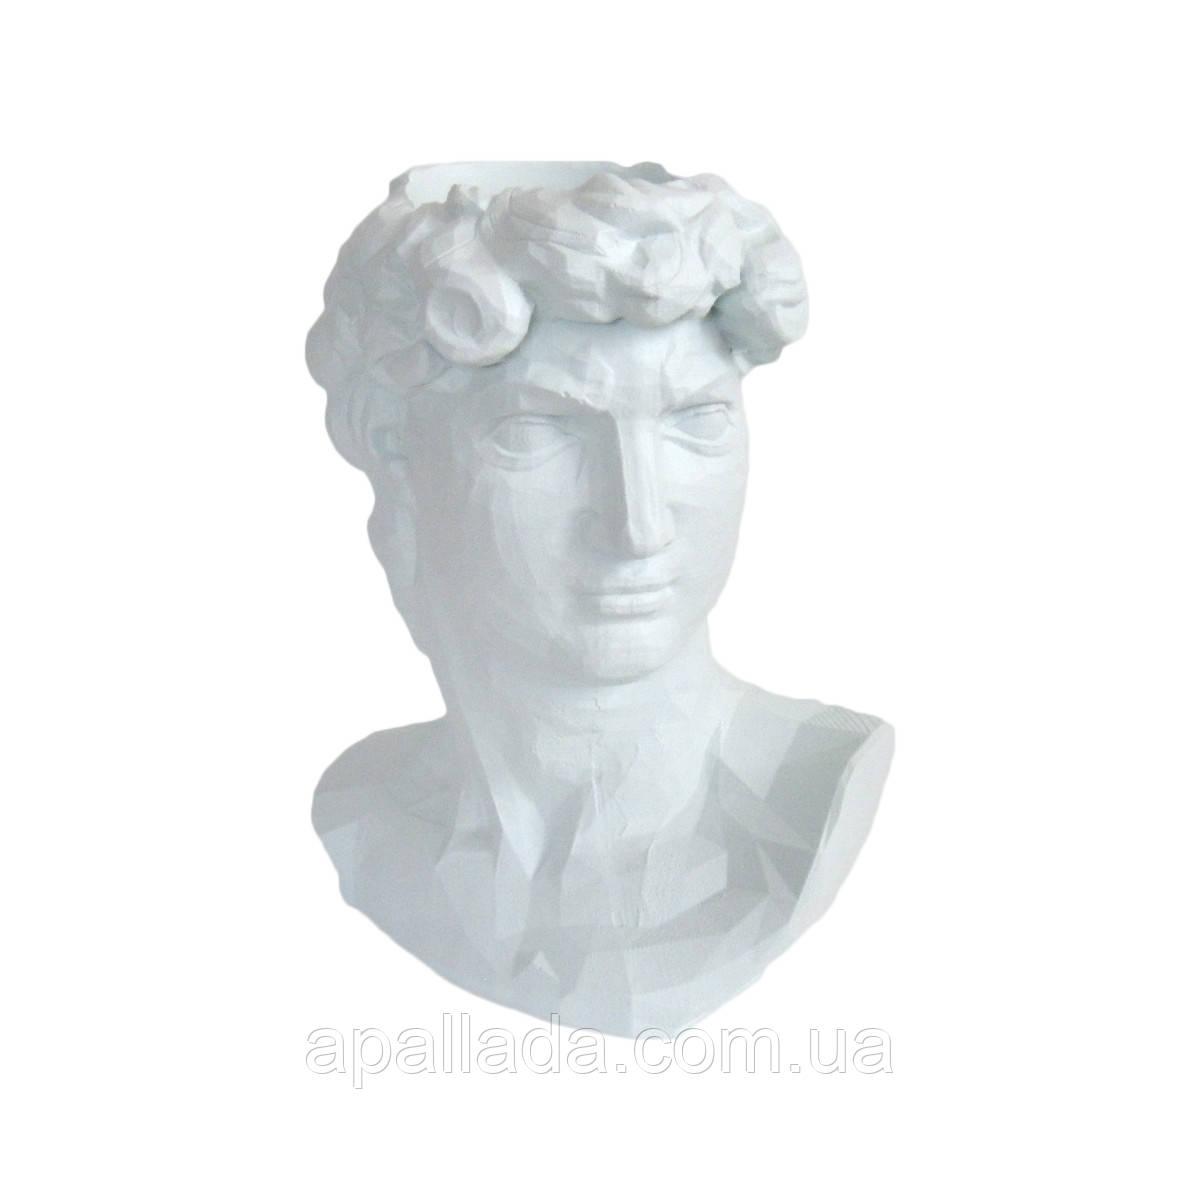 Скульптура органайзер Давид